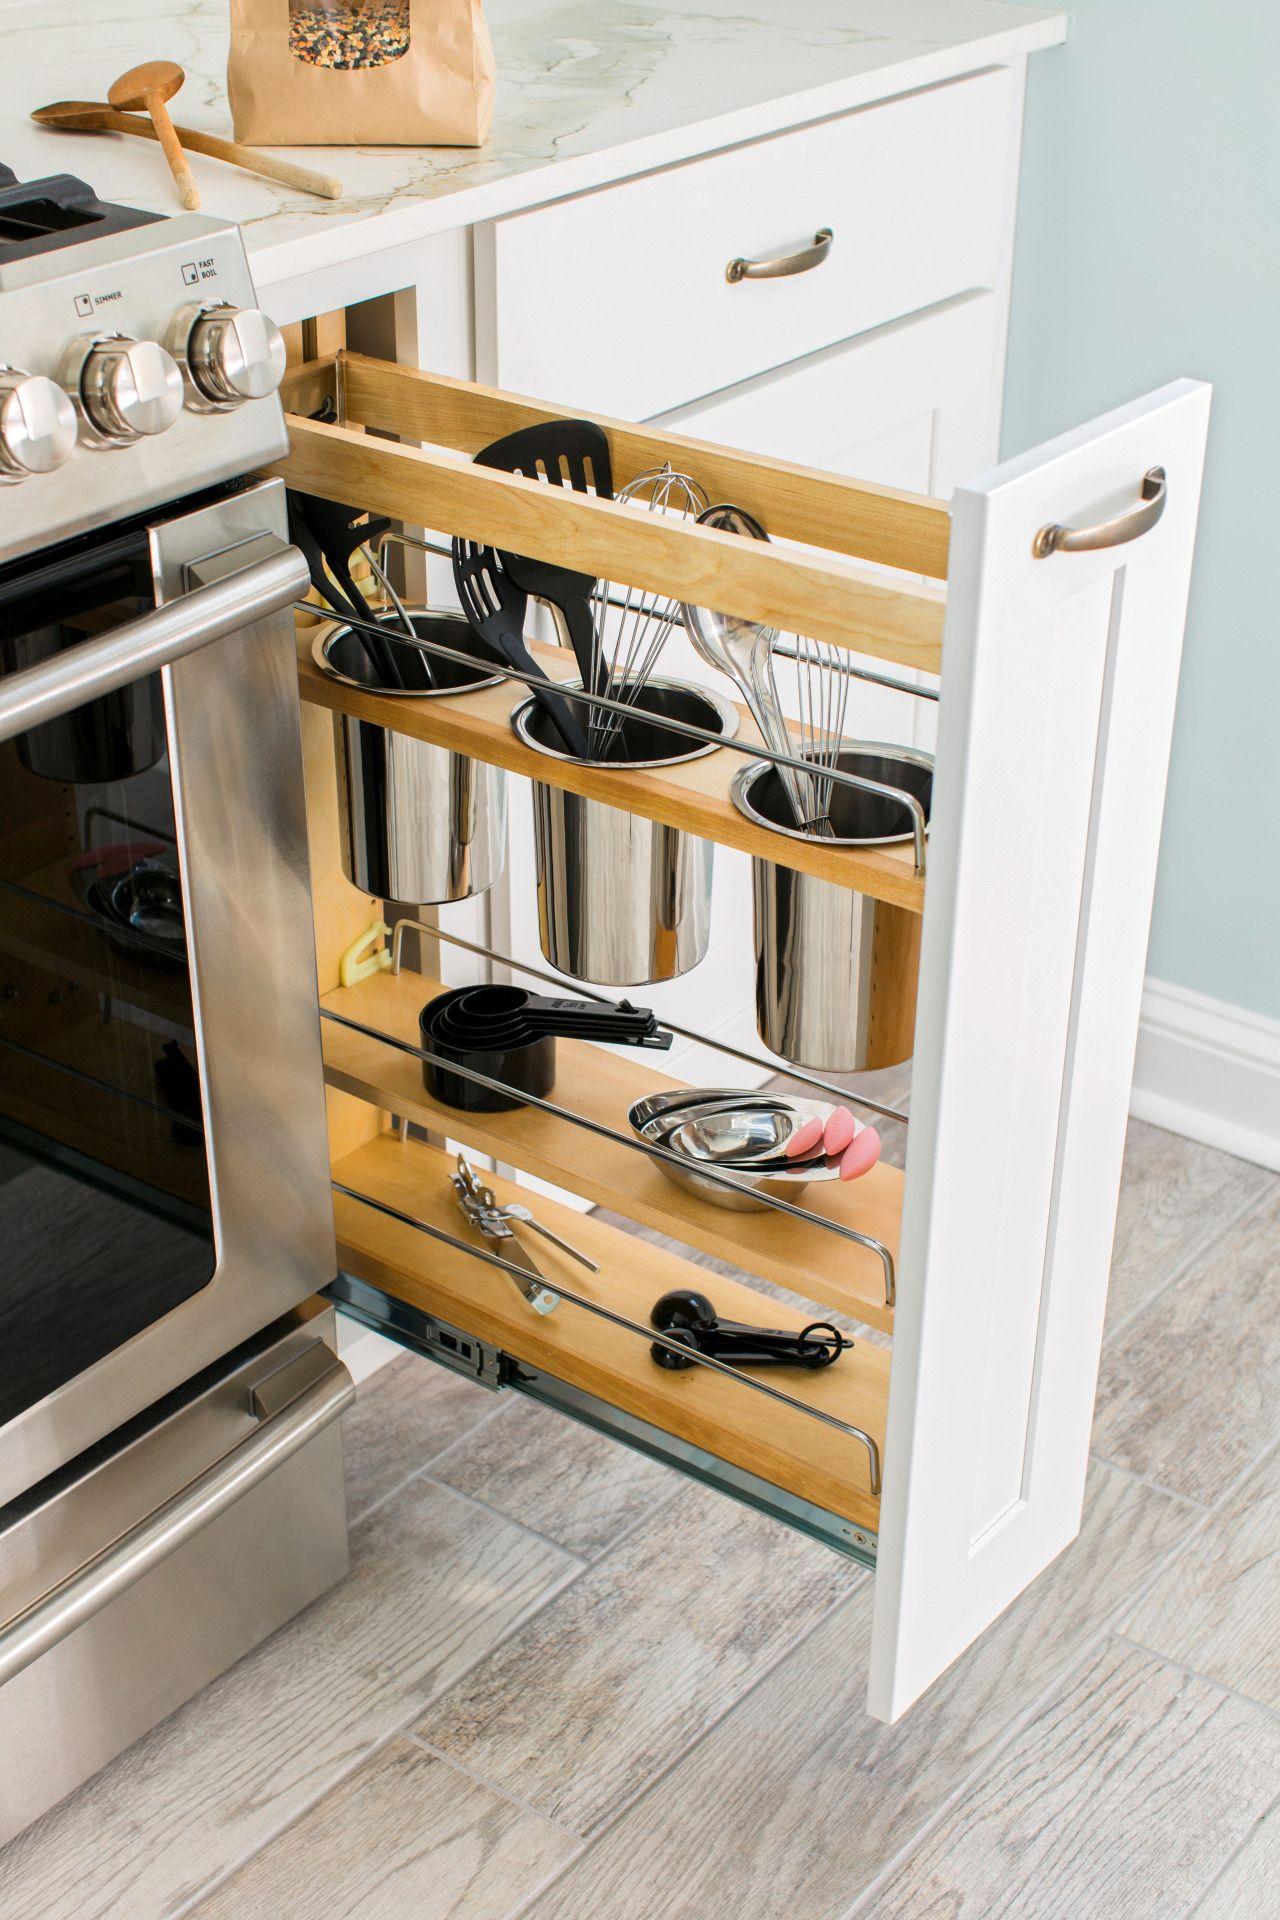 Joni\'s kitchen floorplan is pretty small, so it was important to ...